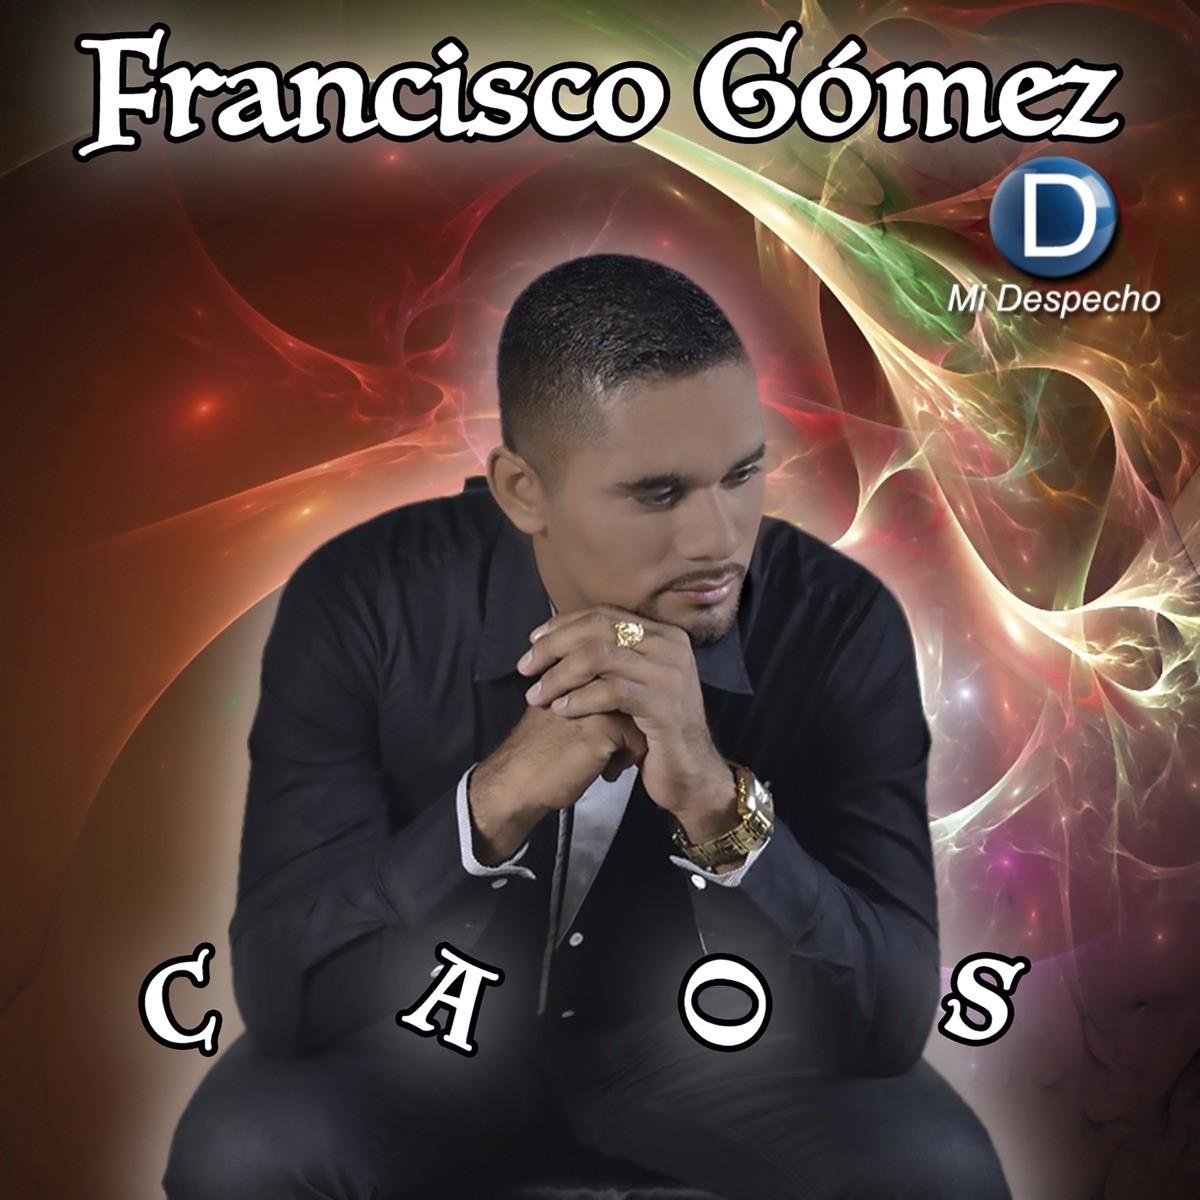 Francisco Gómez Caos Frontal